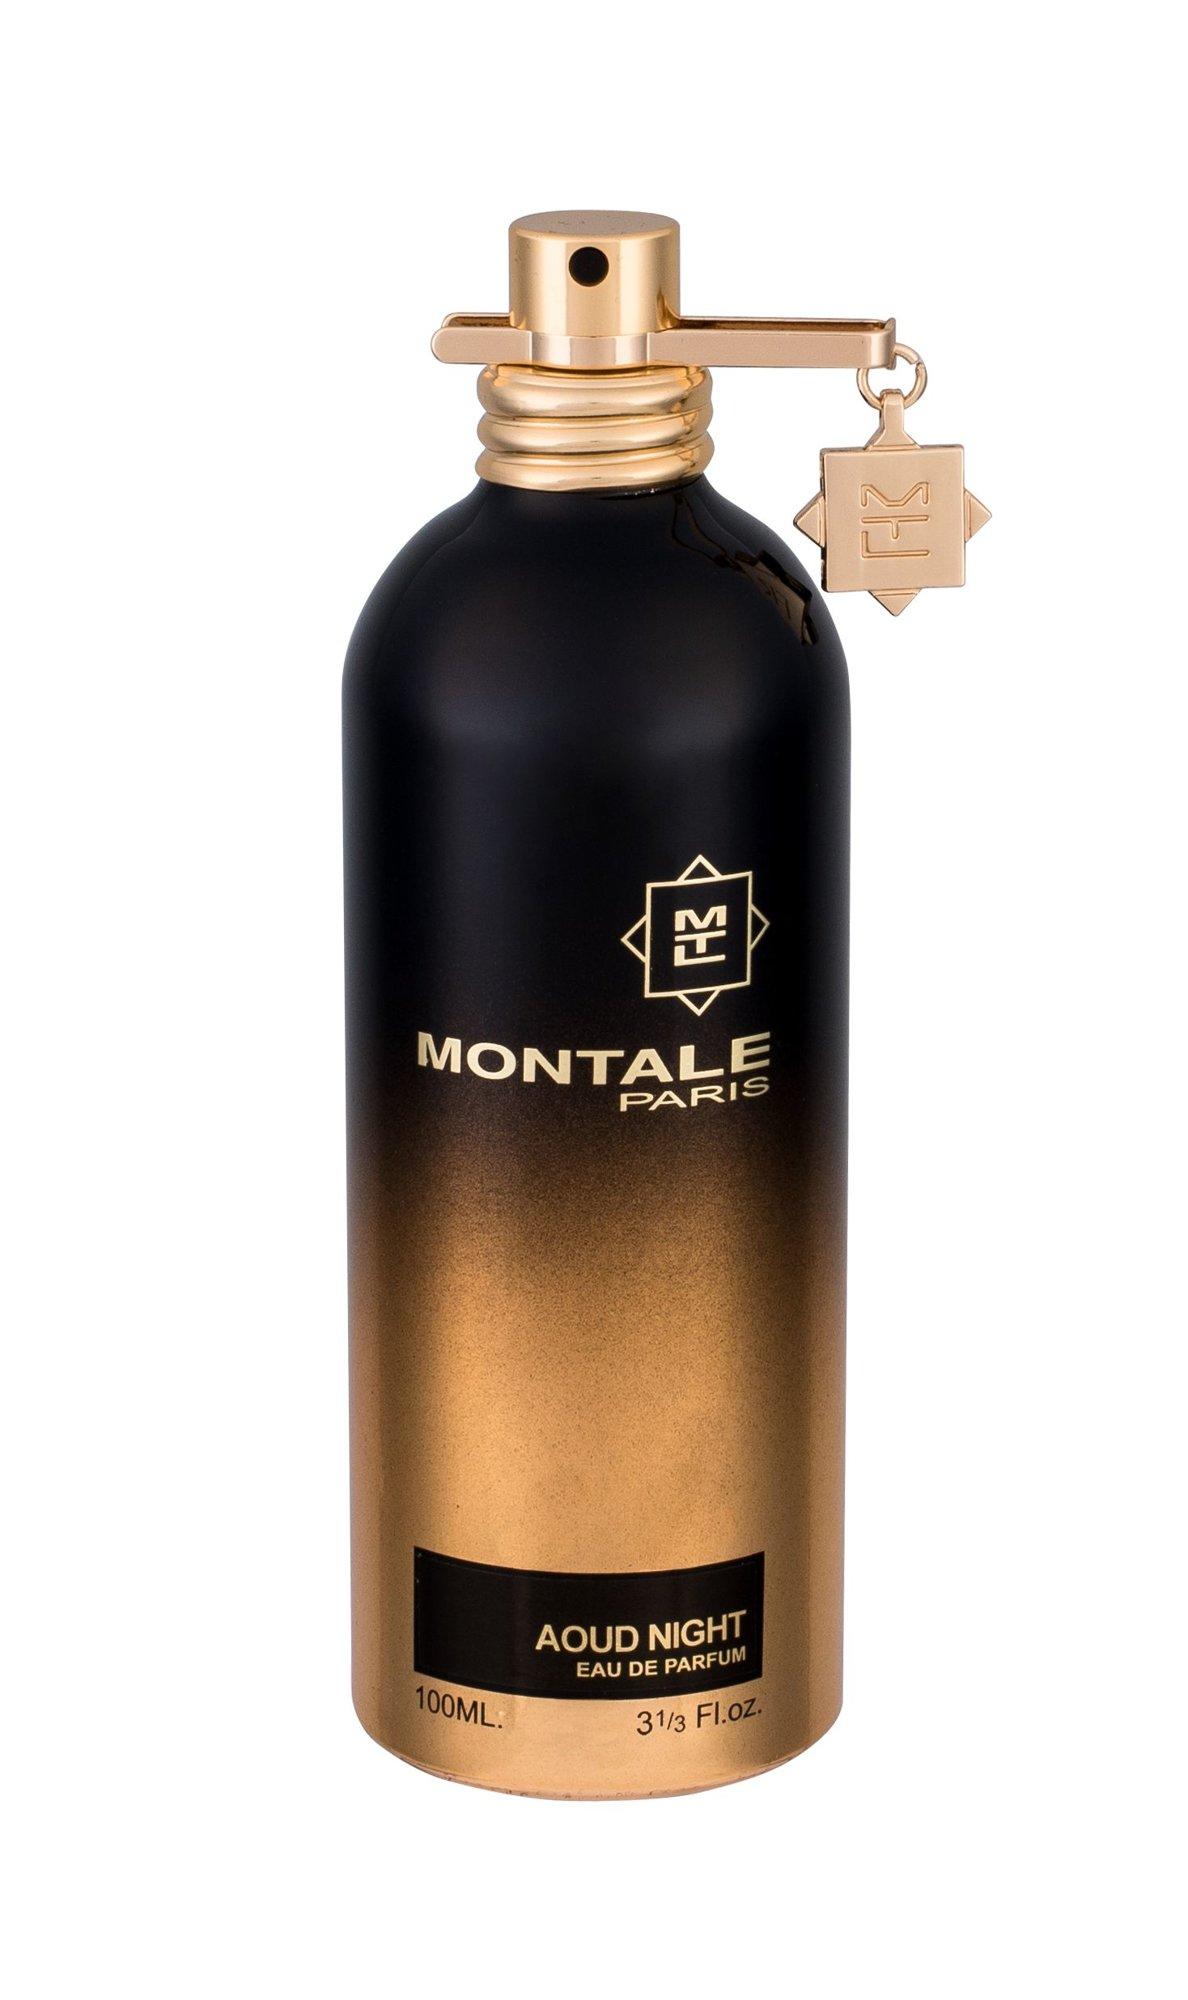 Montale Paris Aoud Night EDP 100ml